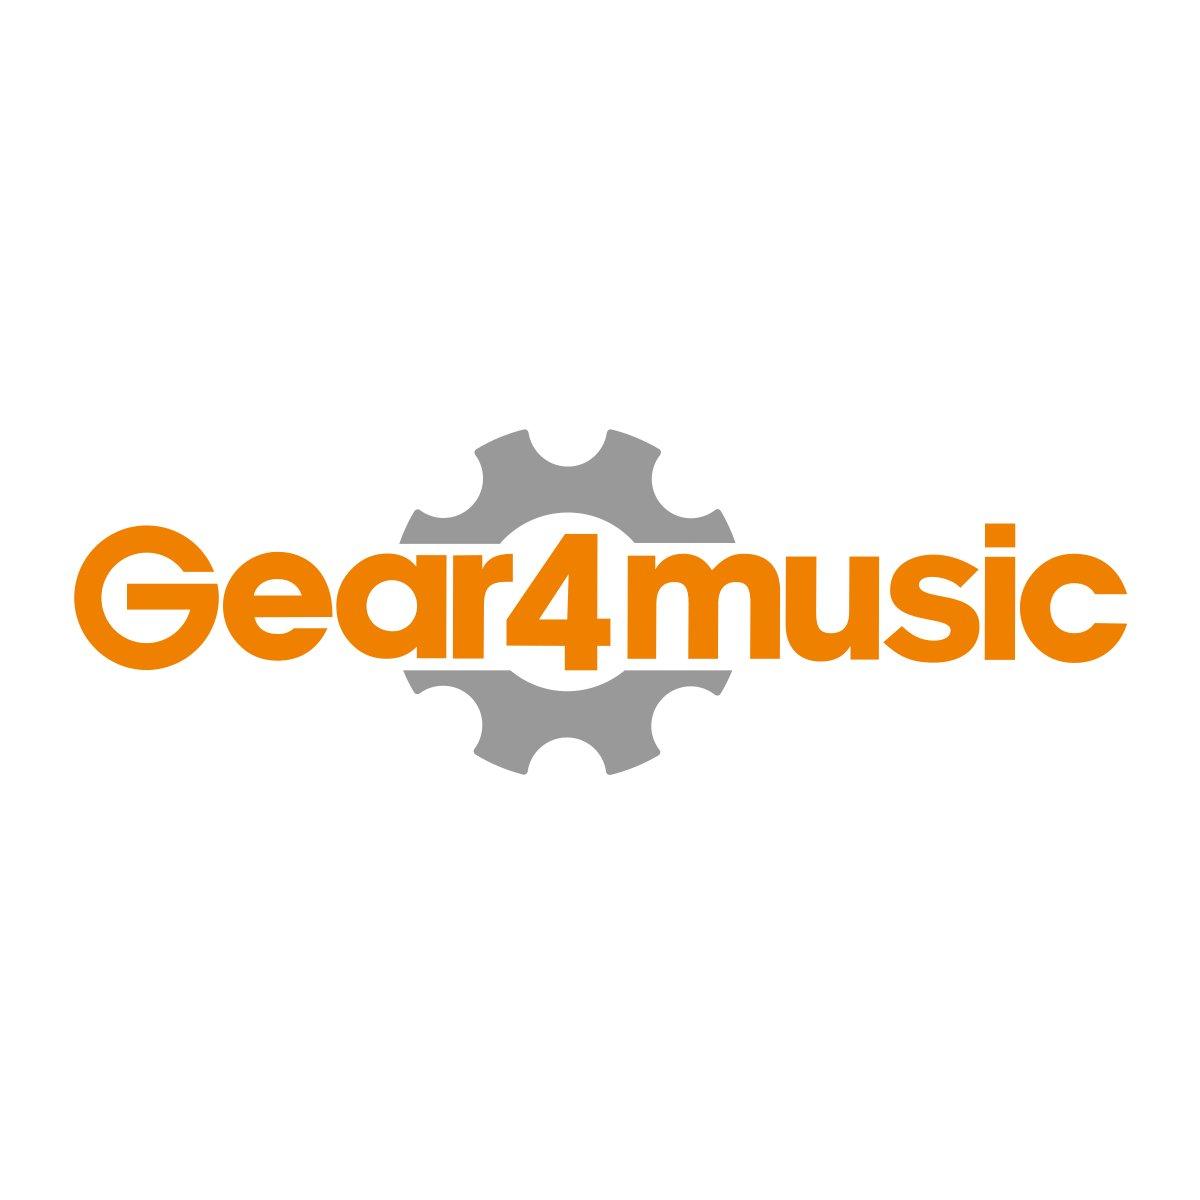 Lučki za notno stojalo od Gear4music, 2 LED